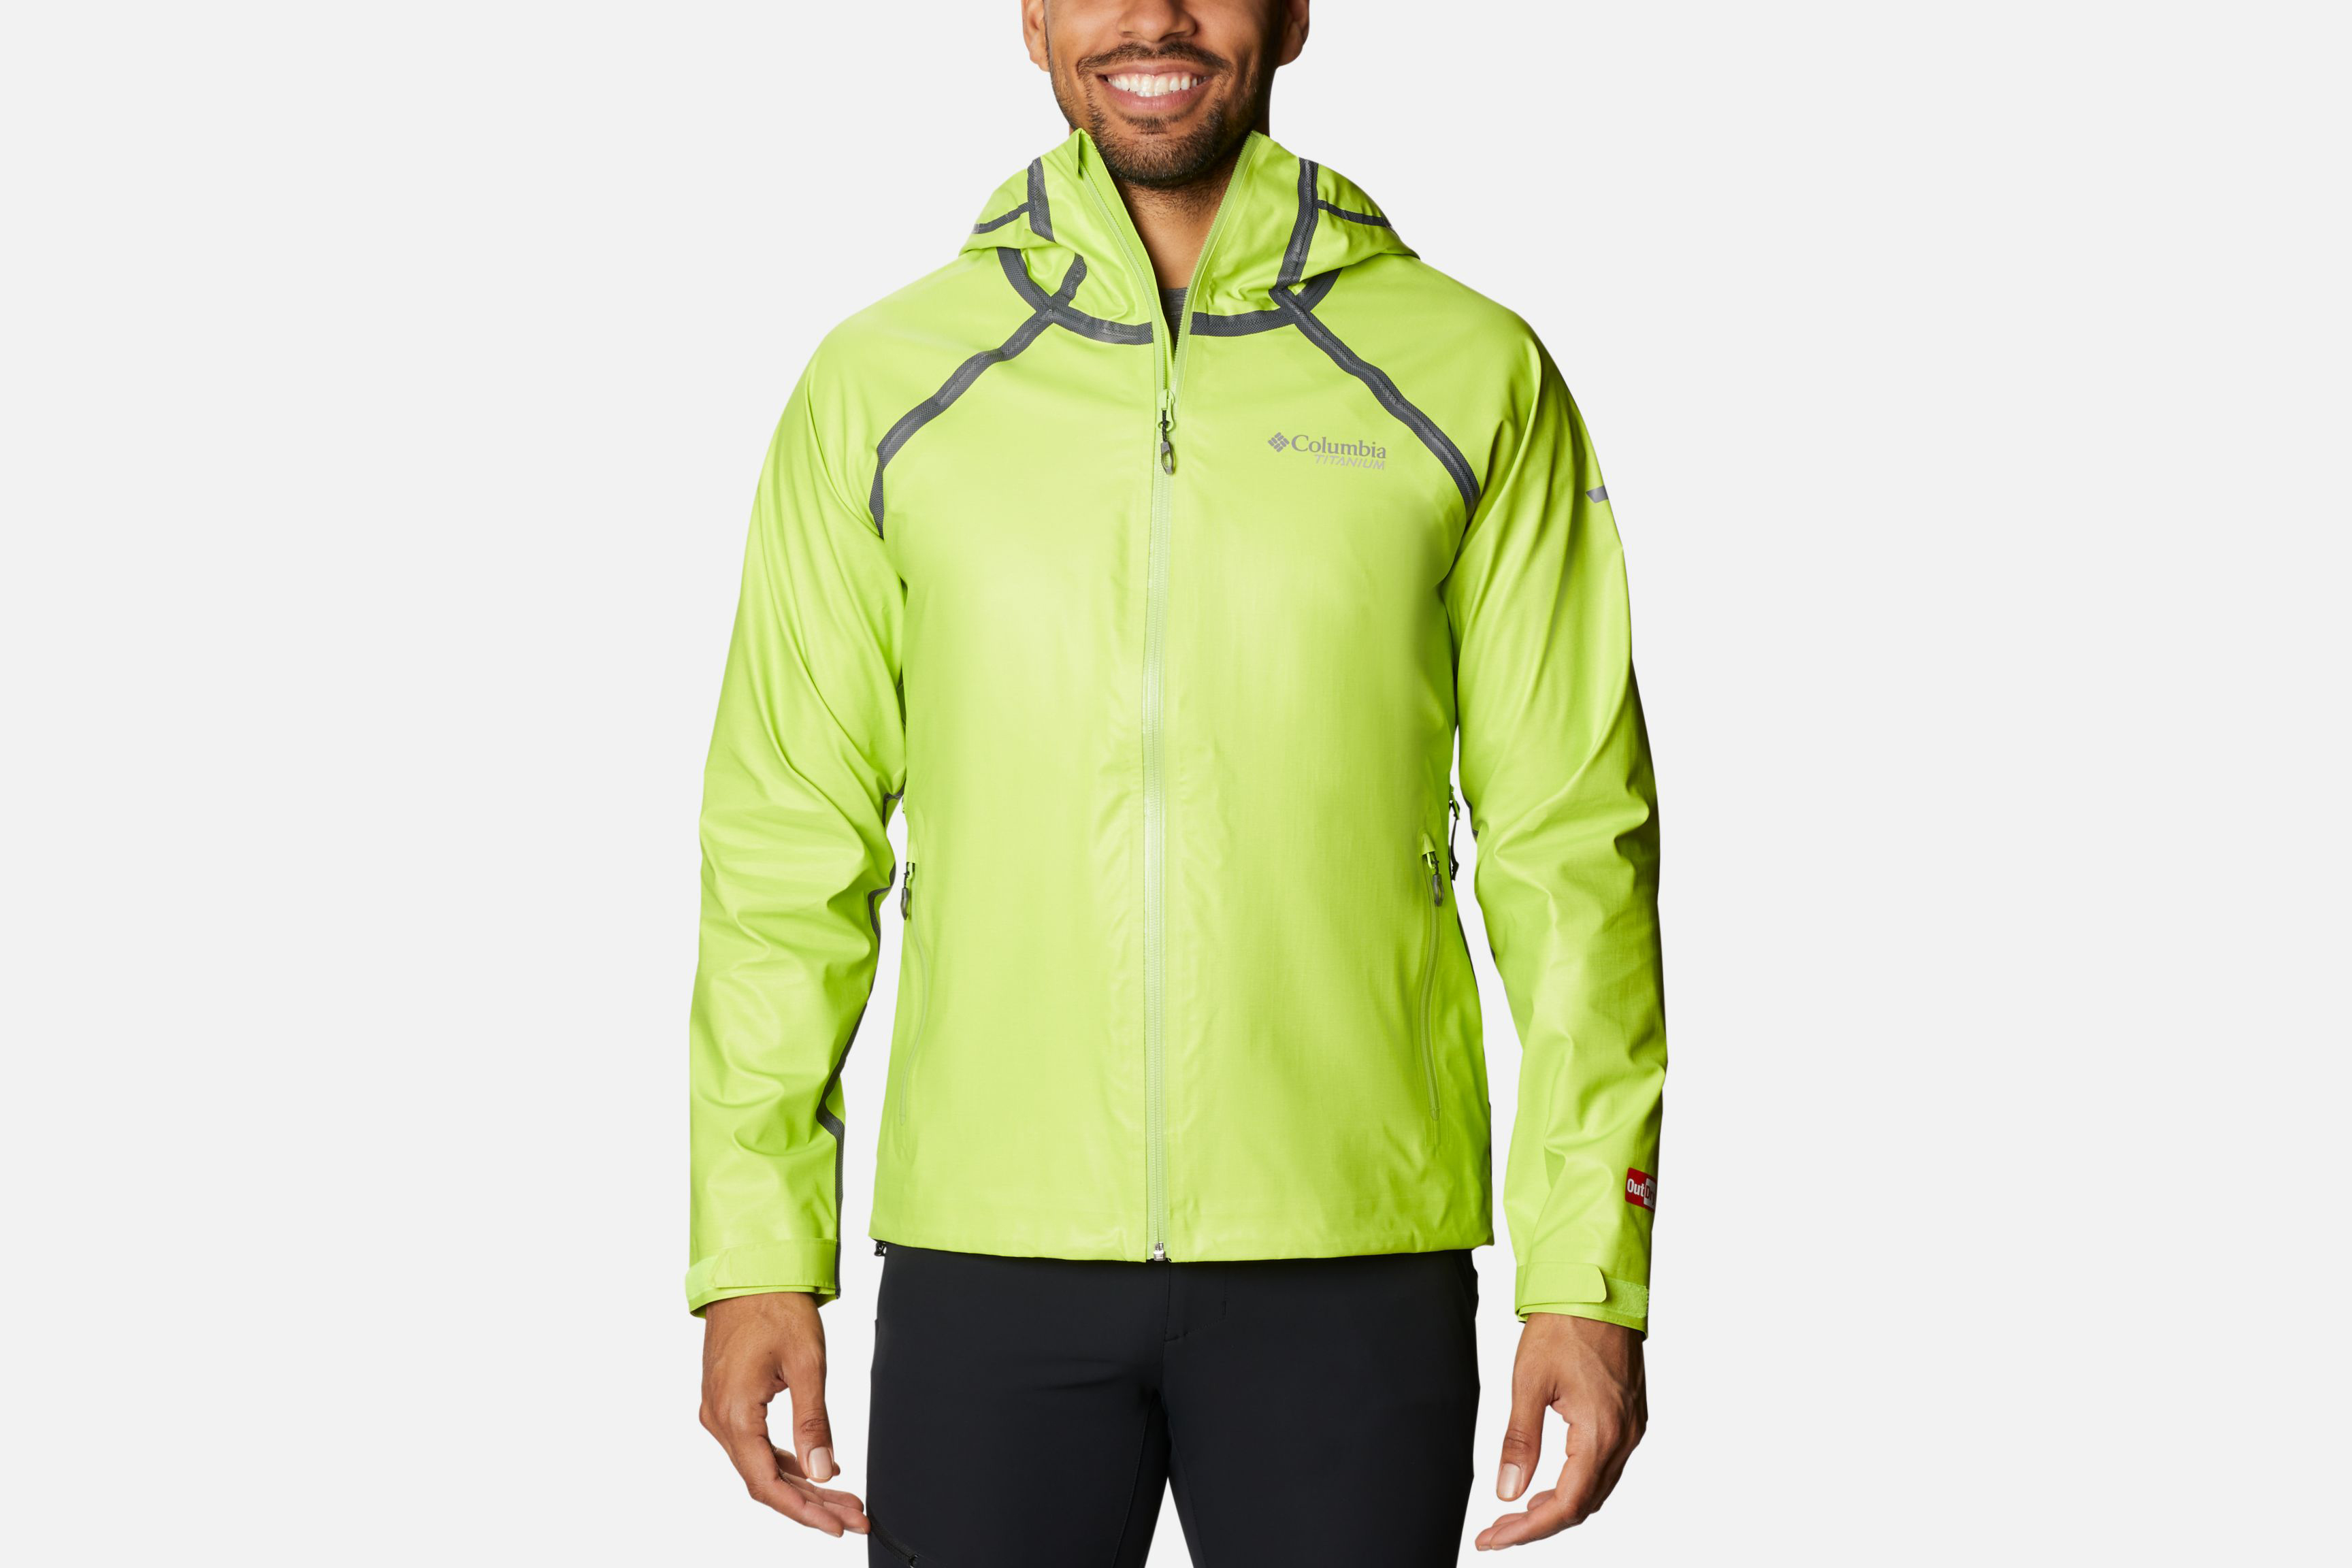 Columbia EX Reign jacket